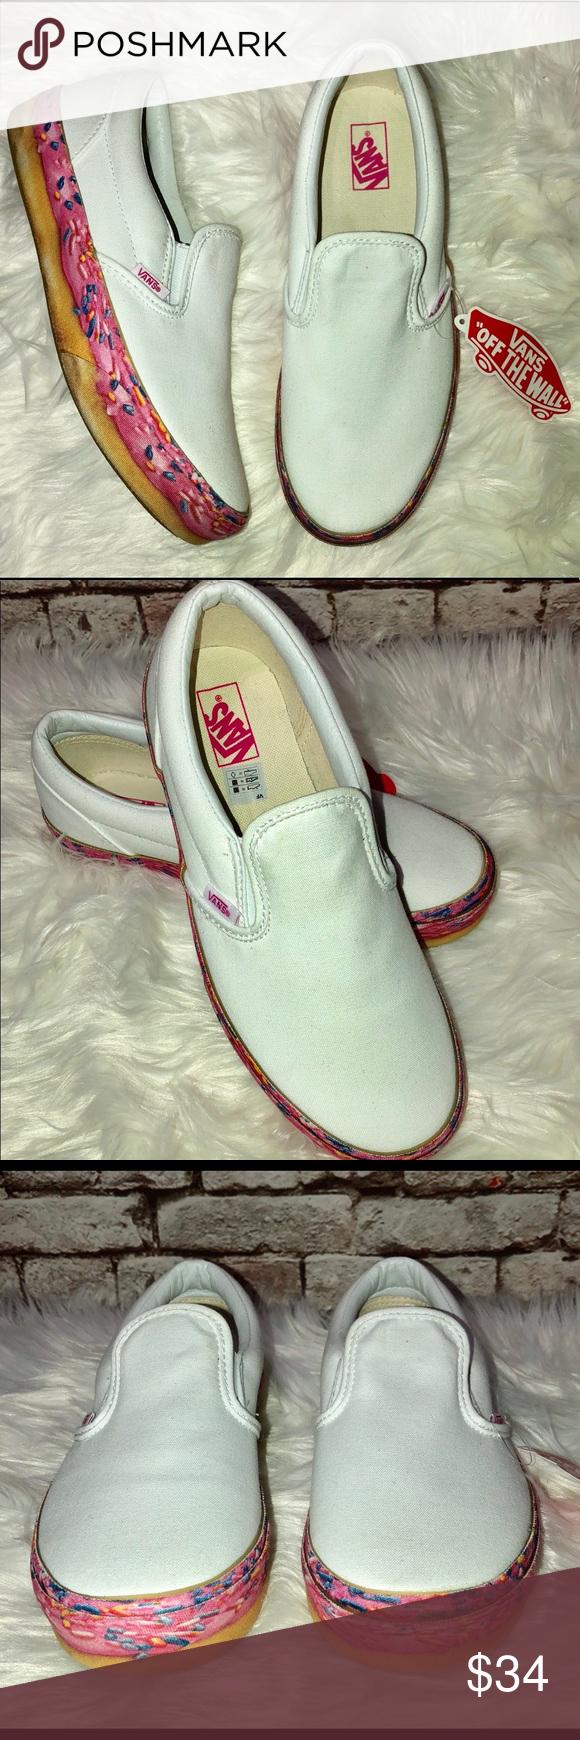 46b6ab517186aa Vans Girl s Platform Skater Donut Sneakers Shoes Brand  VANS Size  Kid s 6  Description